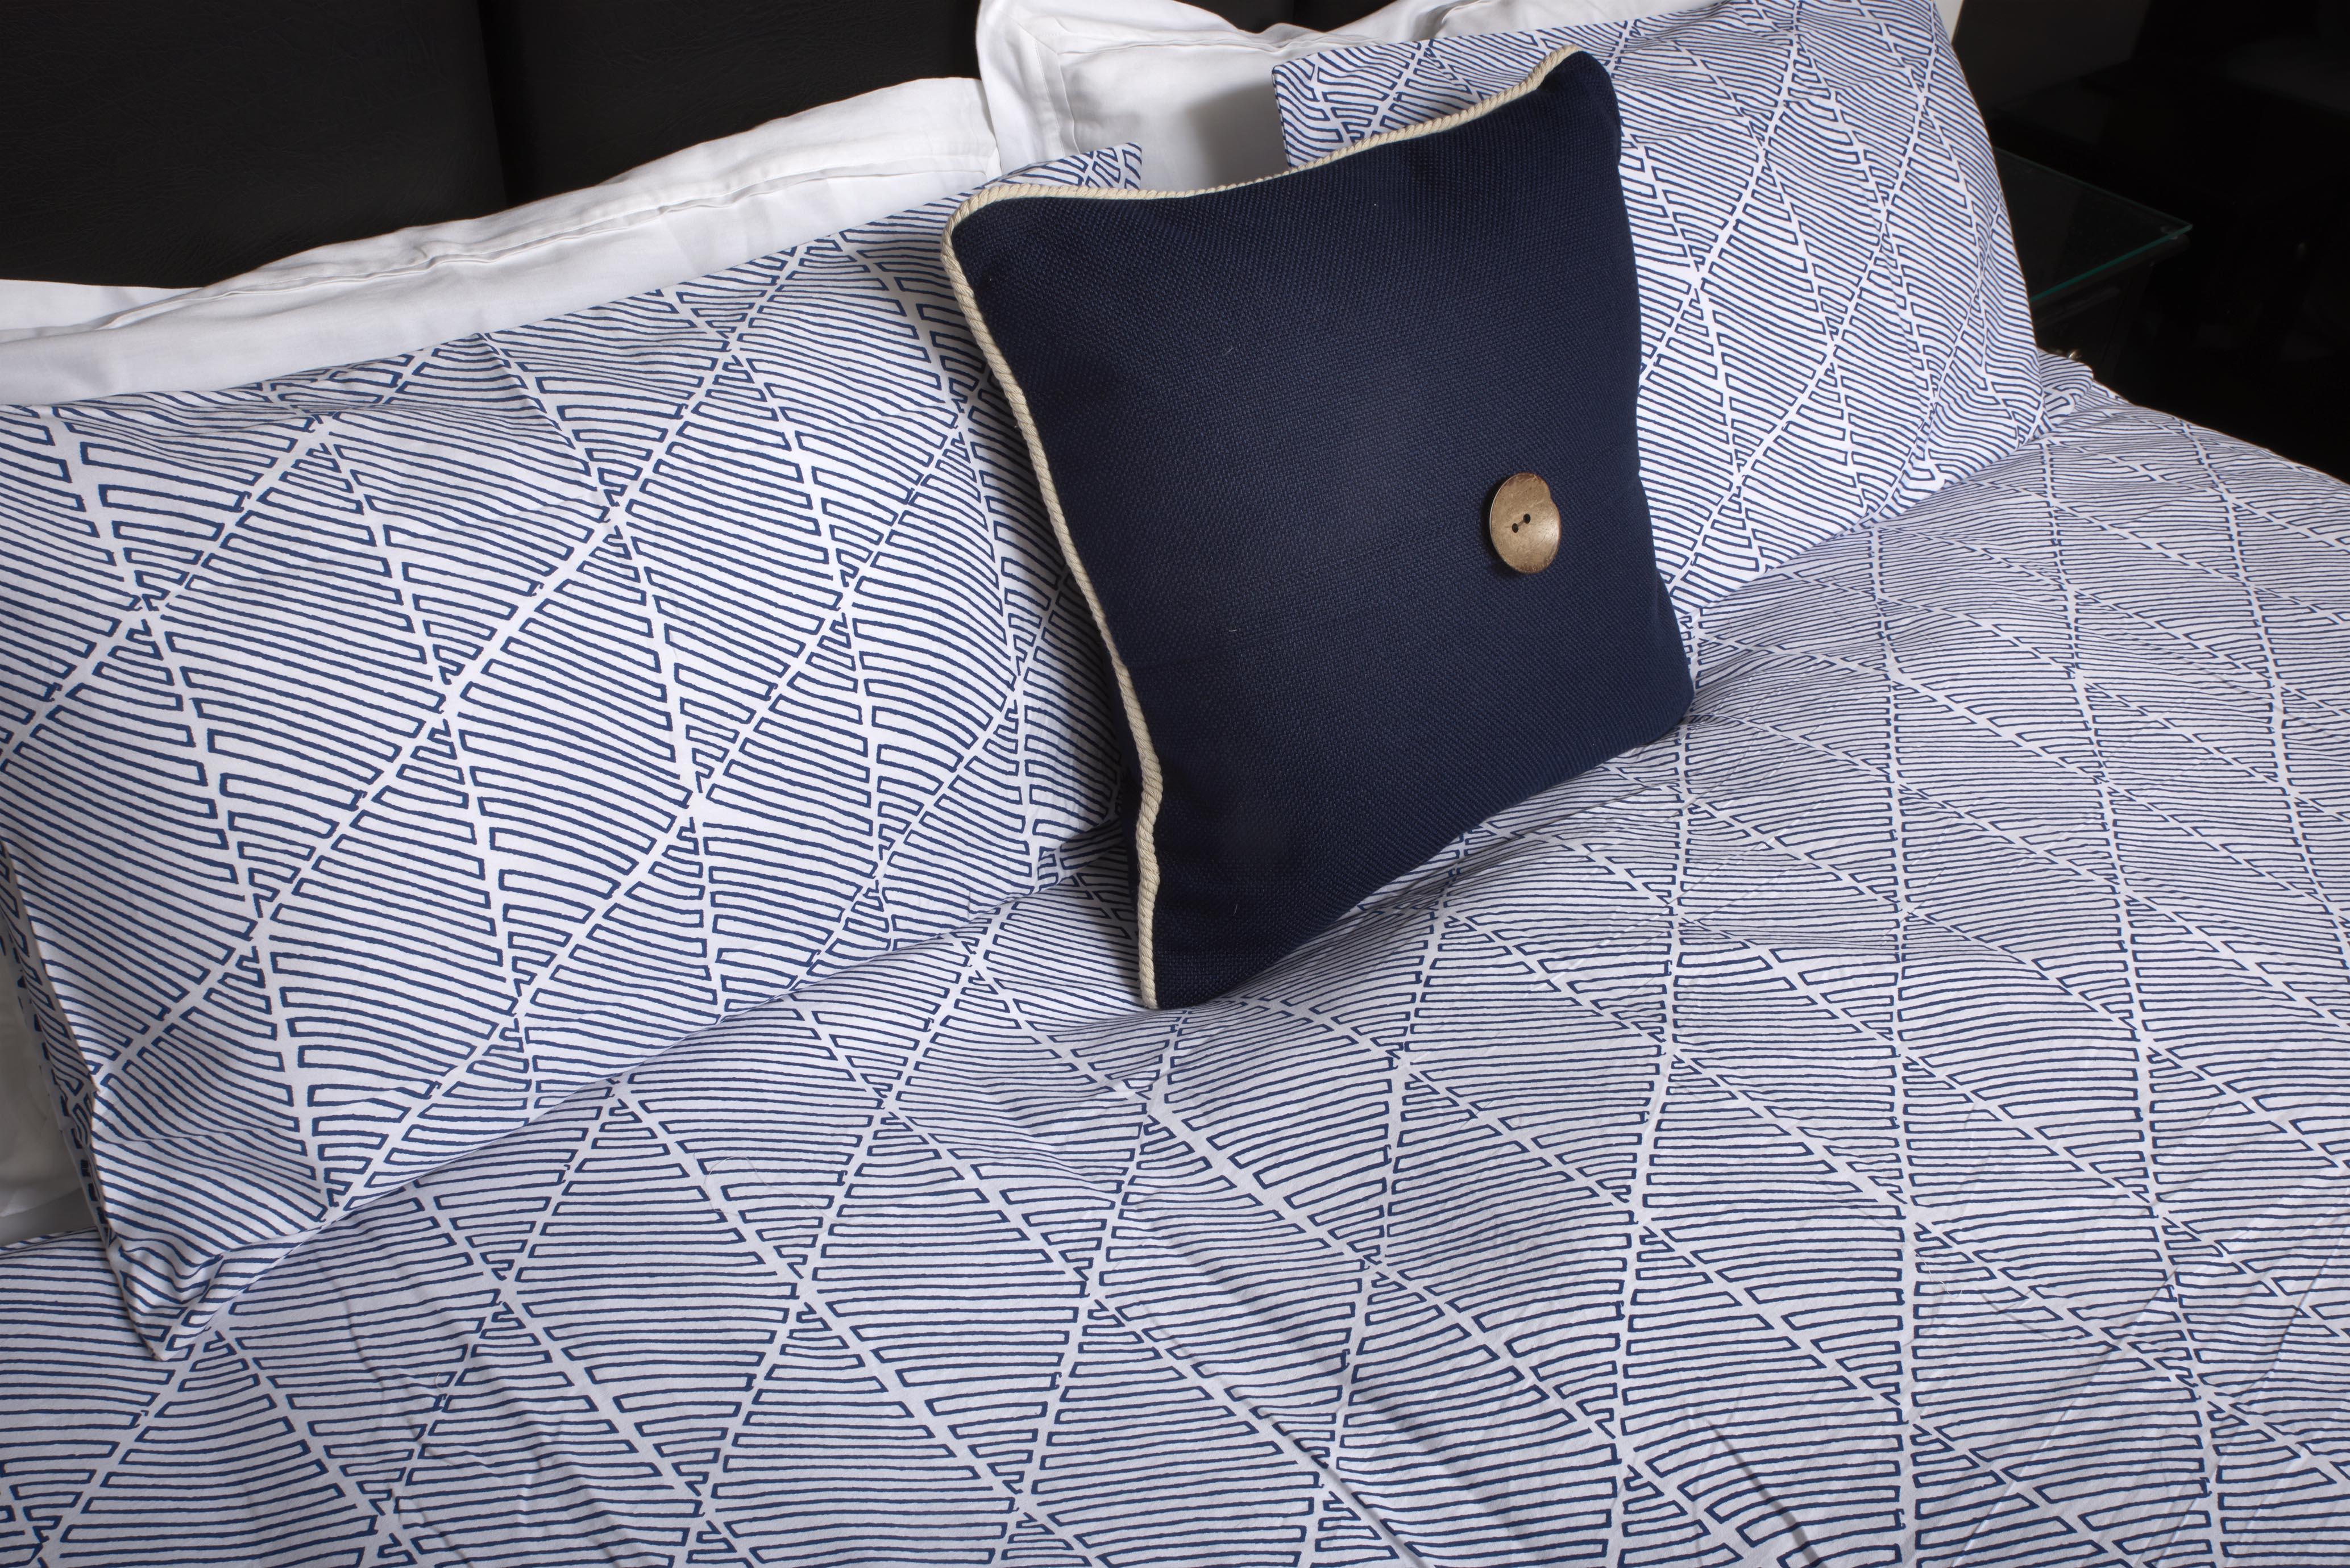 snugsleep pillow wool knop plus dormio pillows gold organic continued